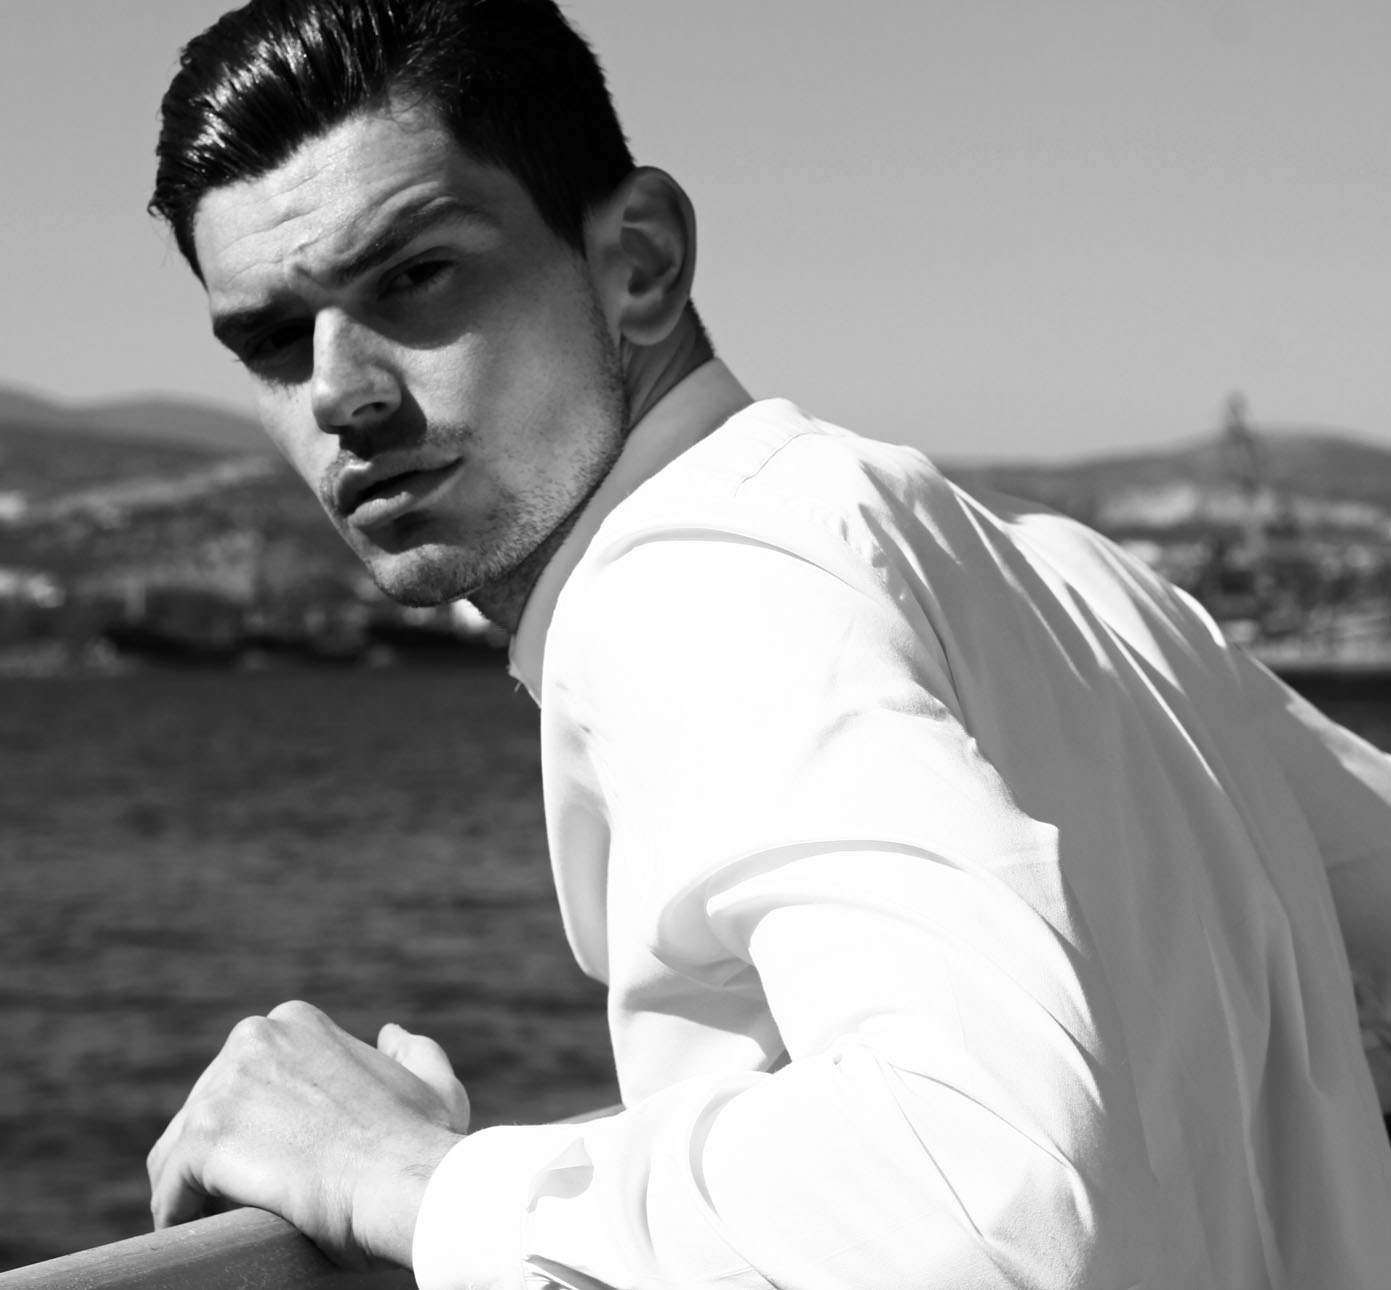 Platon Papagianopoulos